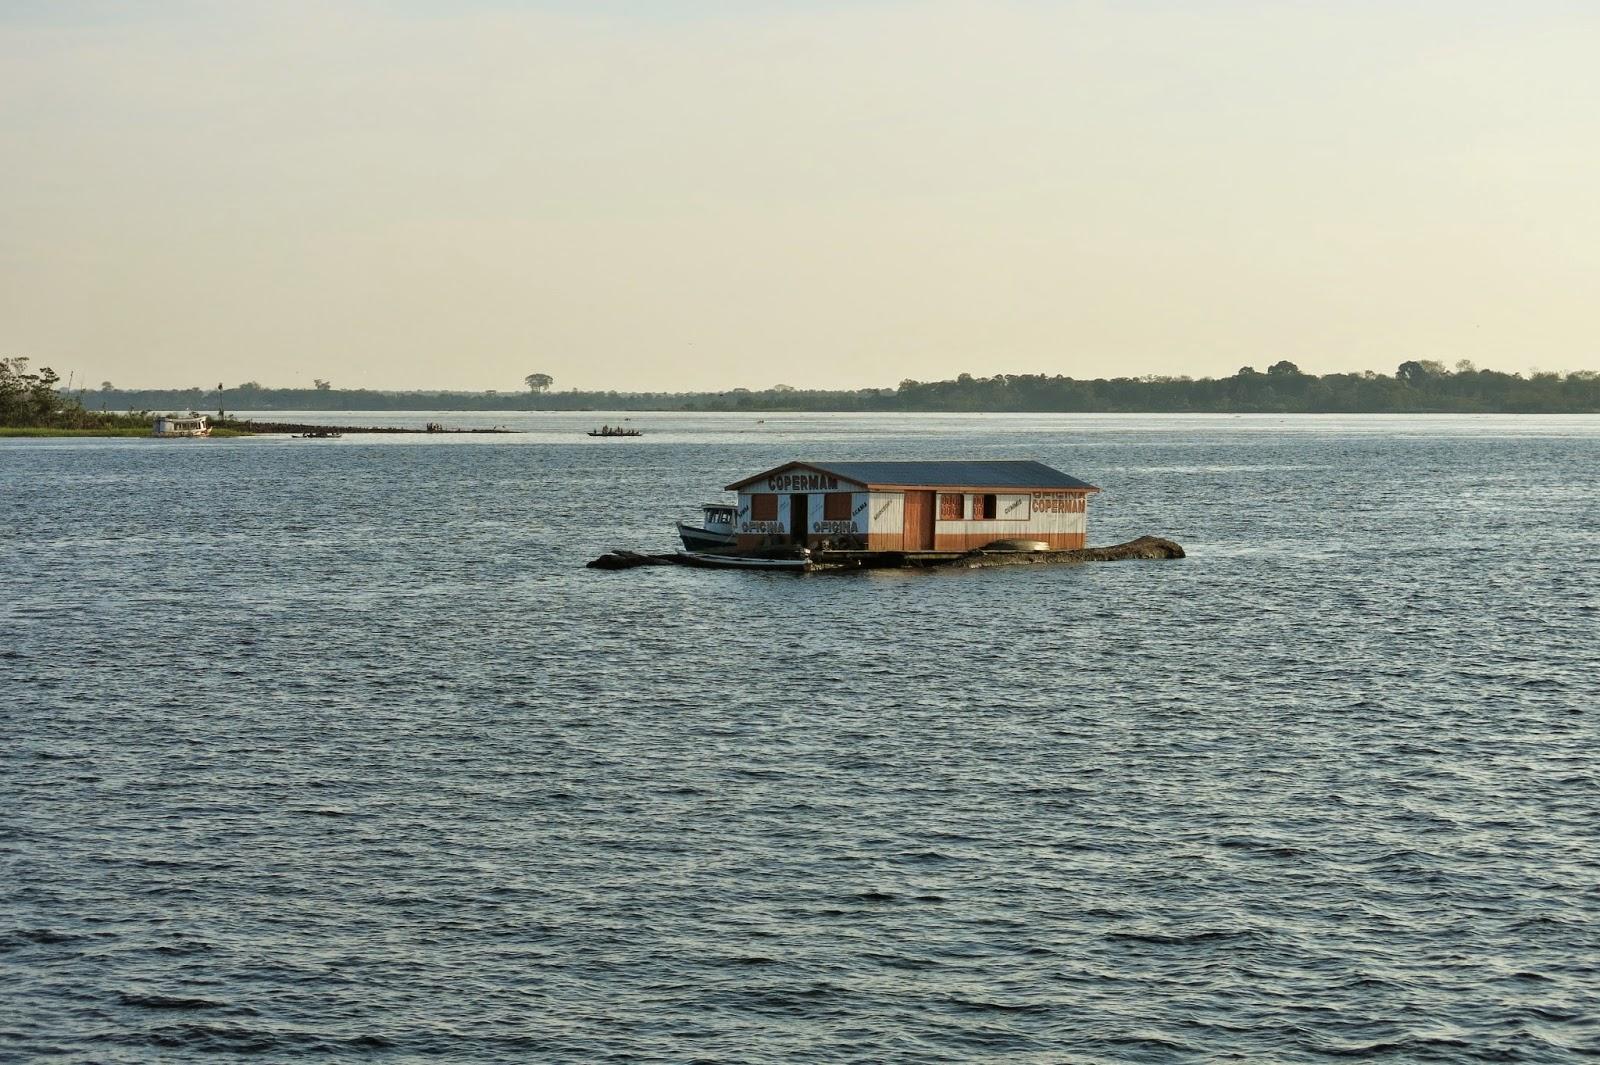 Casas flutuantes ao longo do rio, entre Tefé e Manaus.